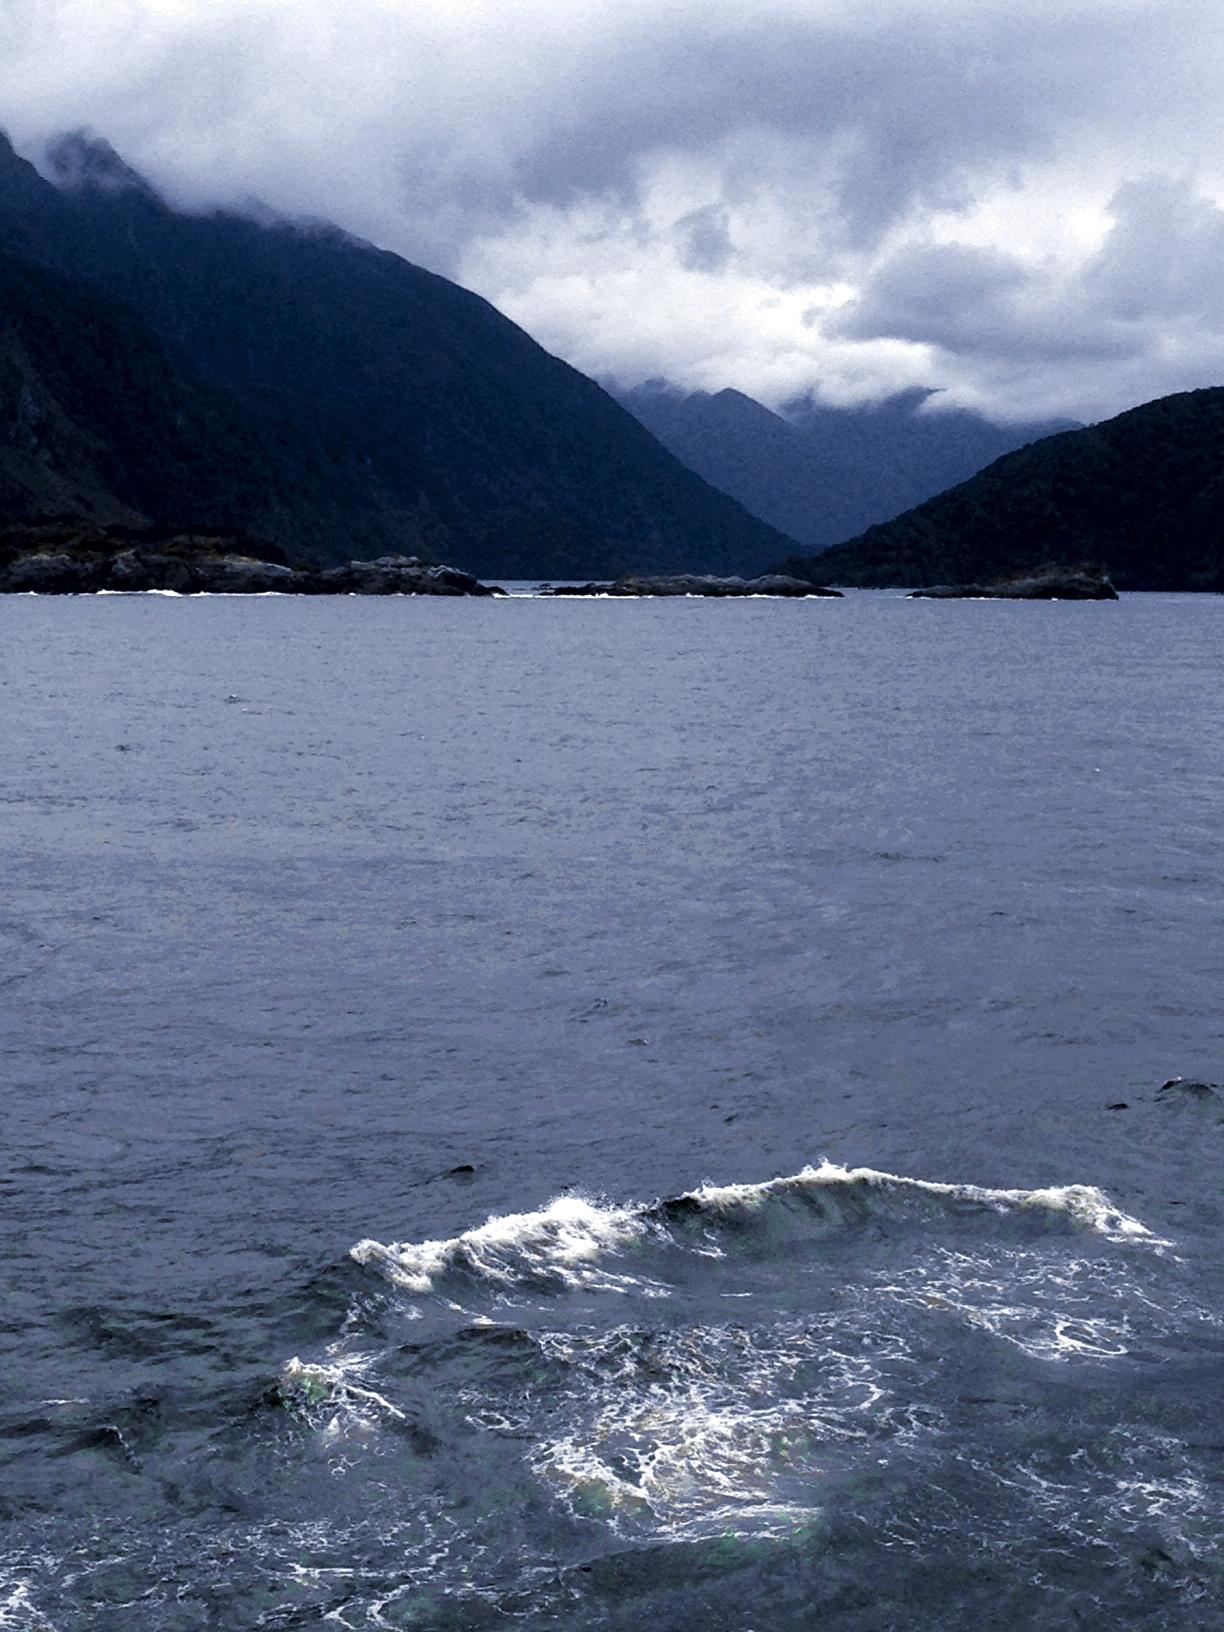 Sea Princess Fjordland cruising